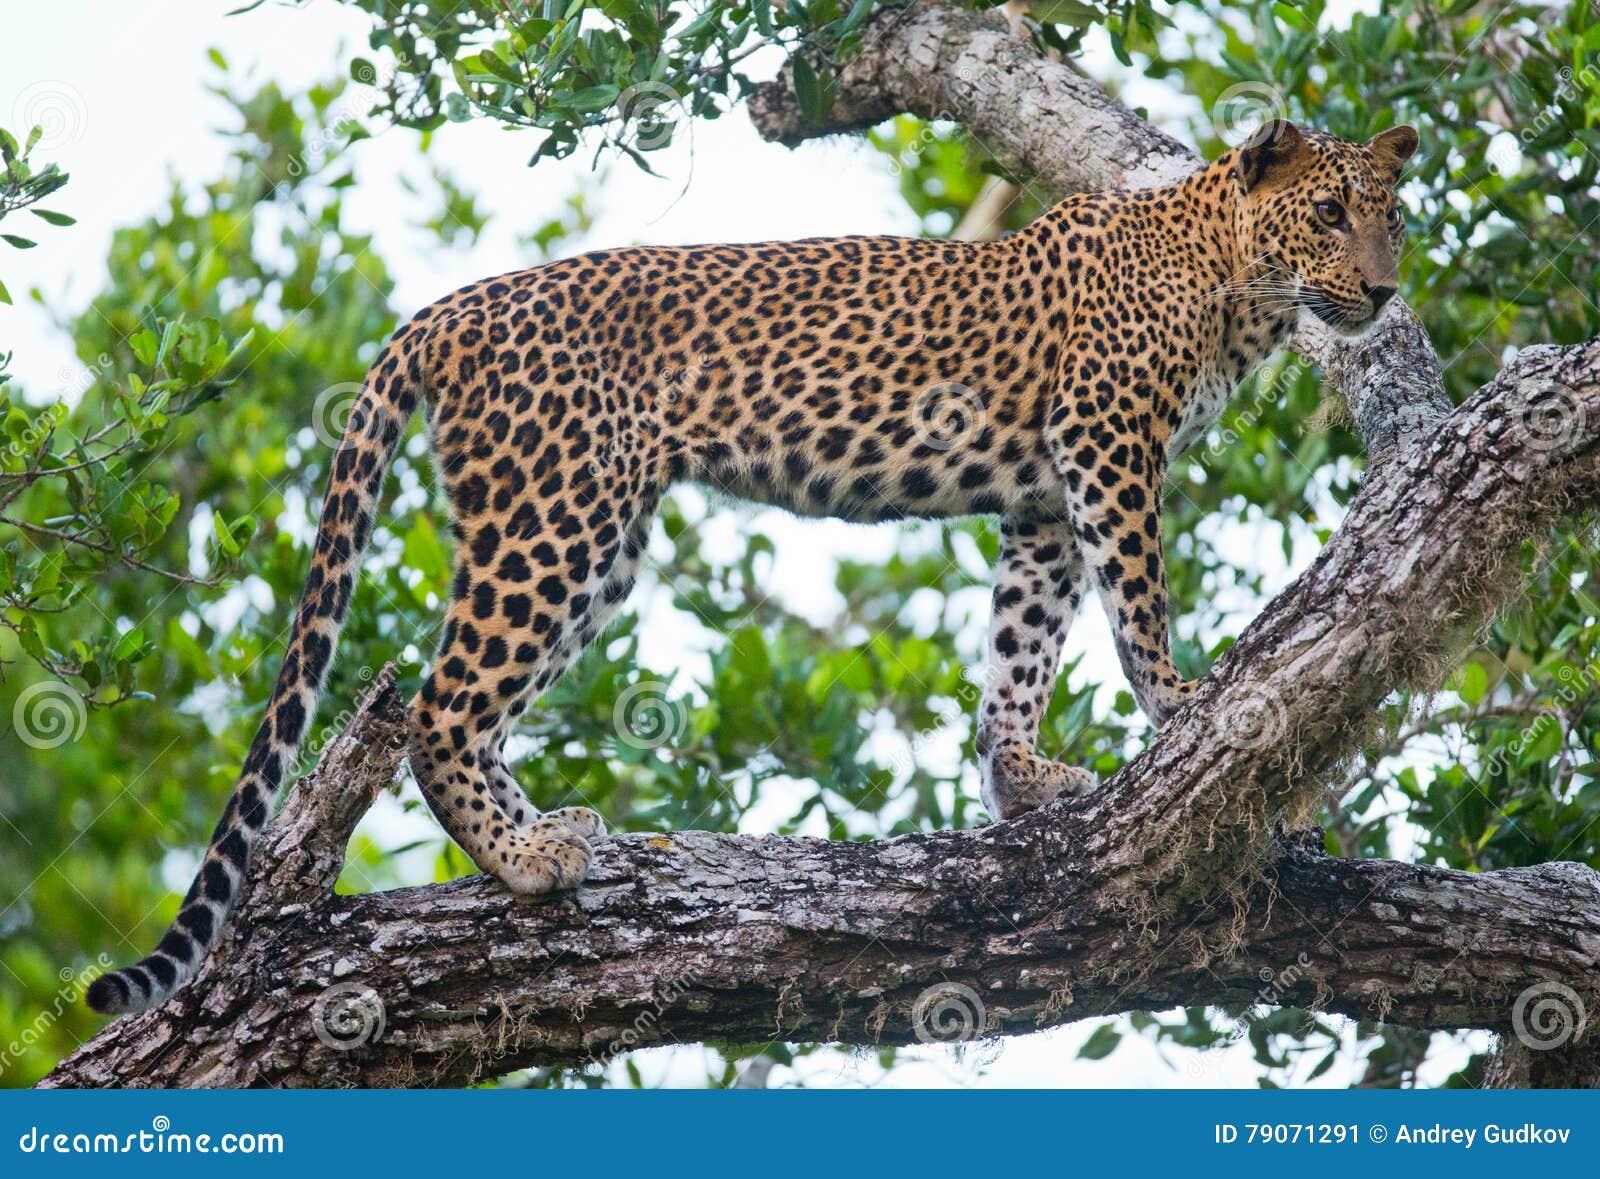 Lujo Leopardo De Impresión De Imagen Tutorial De Uñas Modelo - Ideas ...